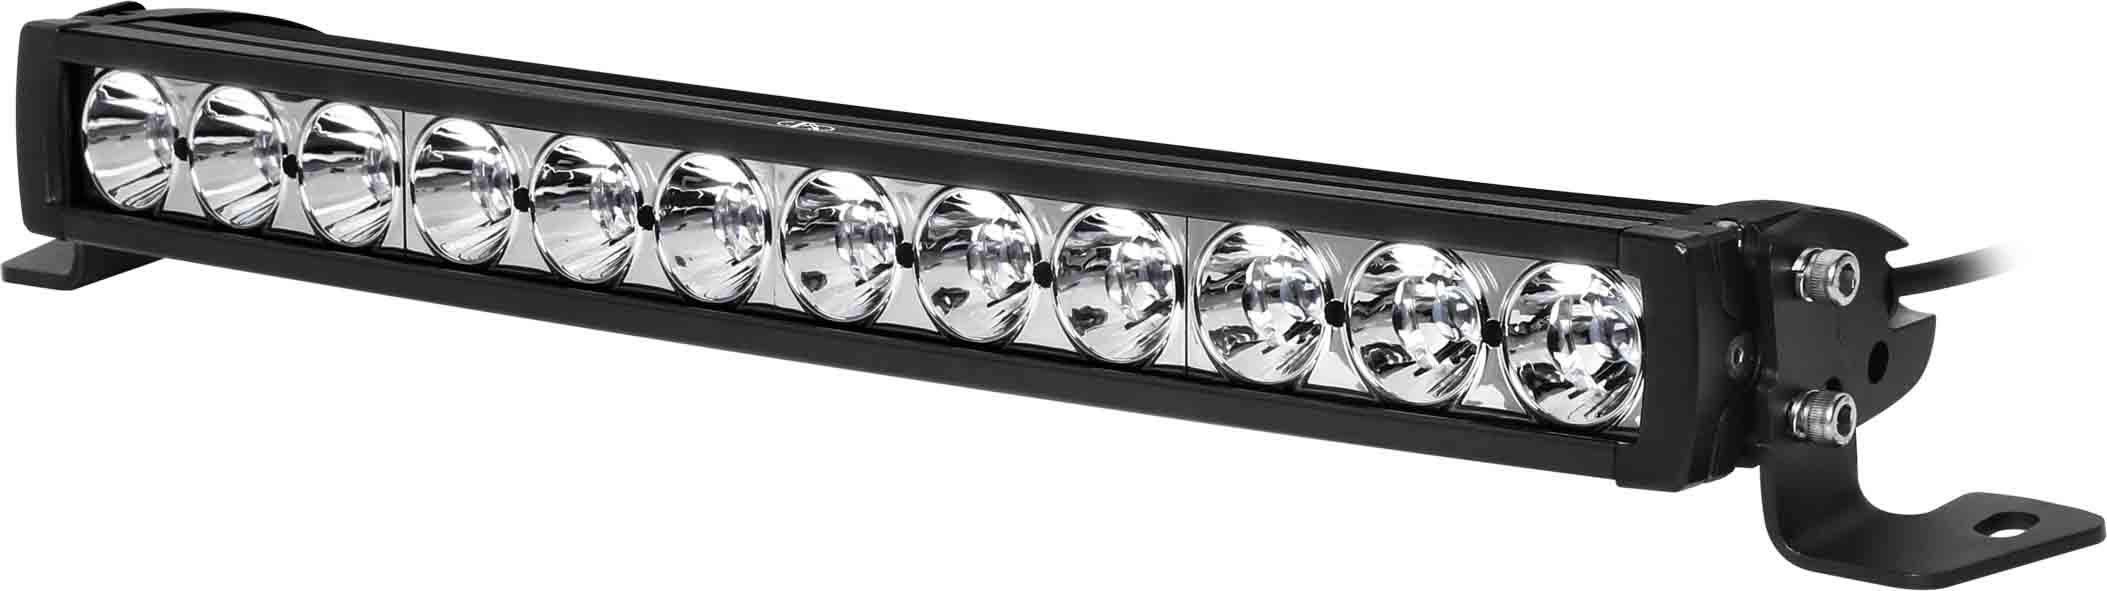 LED ljusramp 12x5 W=60W CURVED